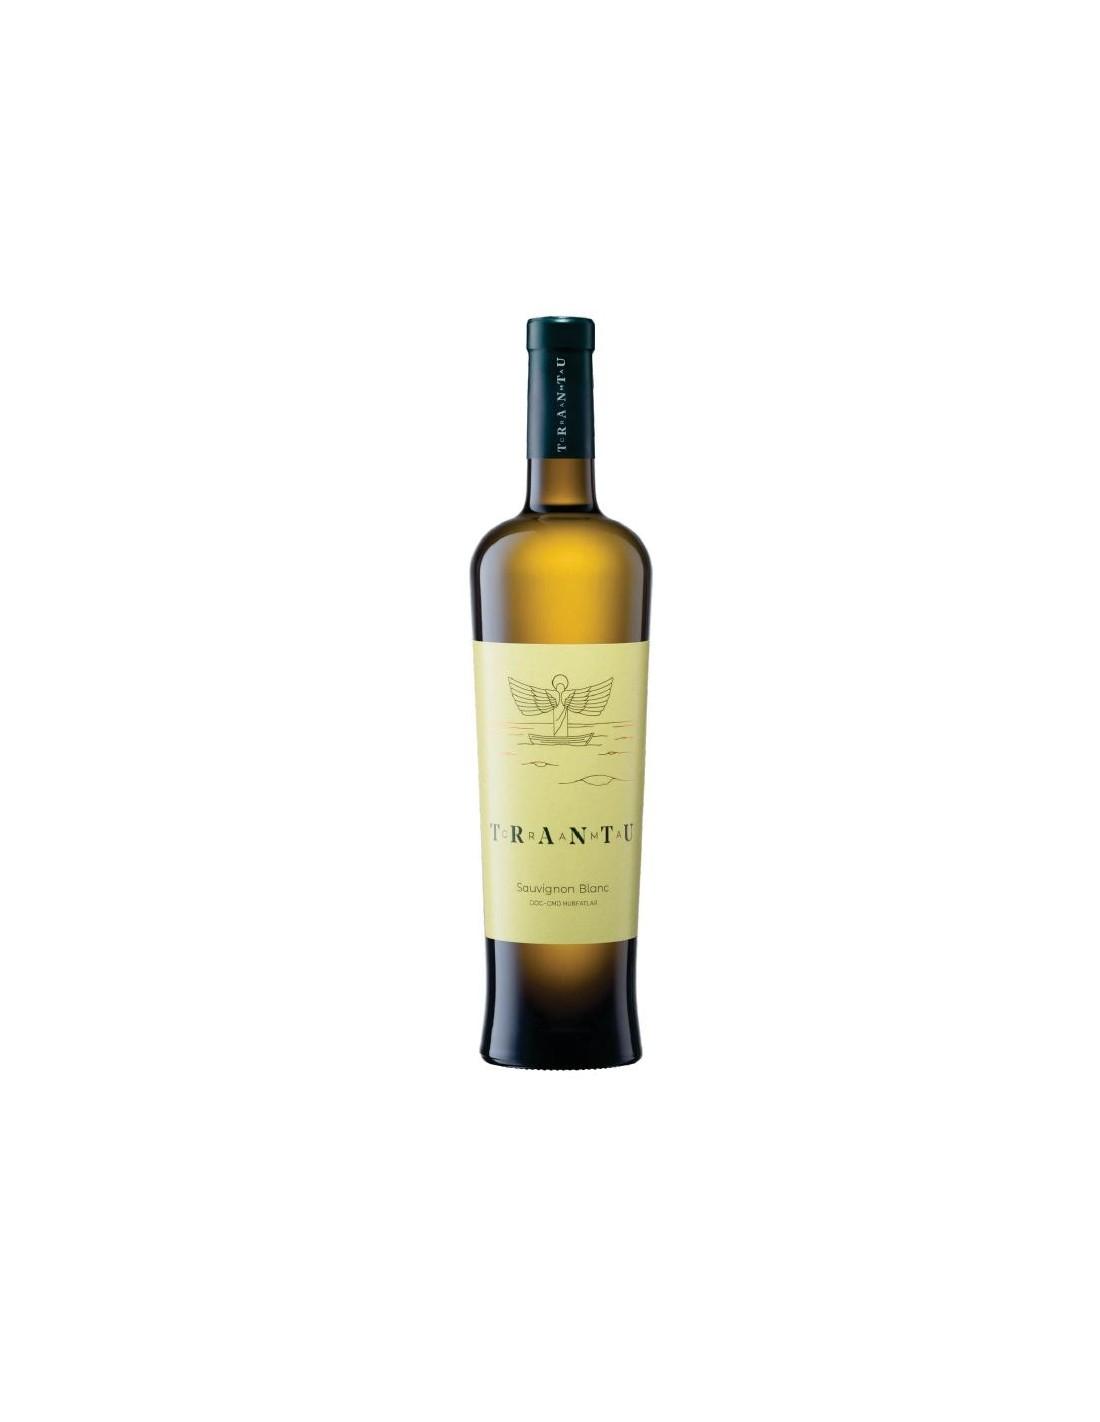 Vin alb sec, Sauvignon Blanc, Crama Trantu Murfatlar, 0.75L, 13.5% alc., Romania